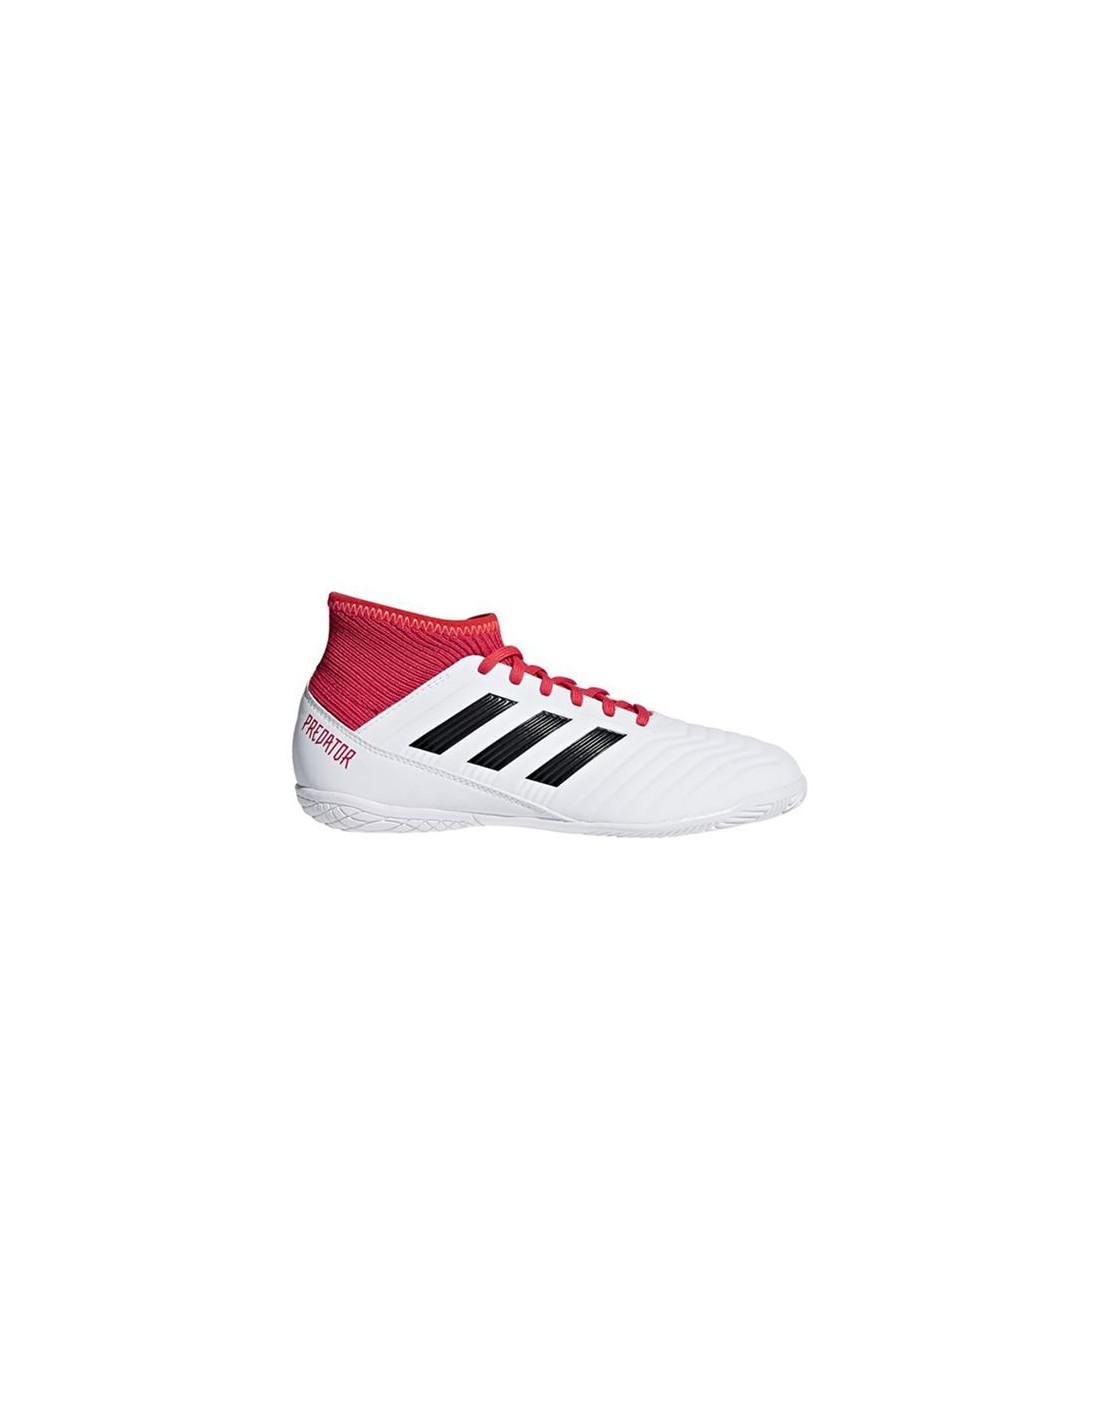 Zapatillas de Fútbol Sala adidas Predator Tango 18.3